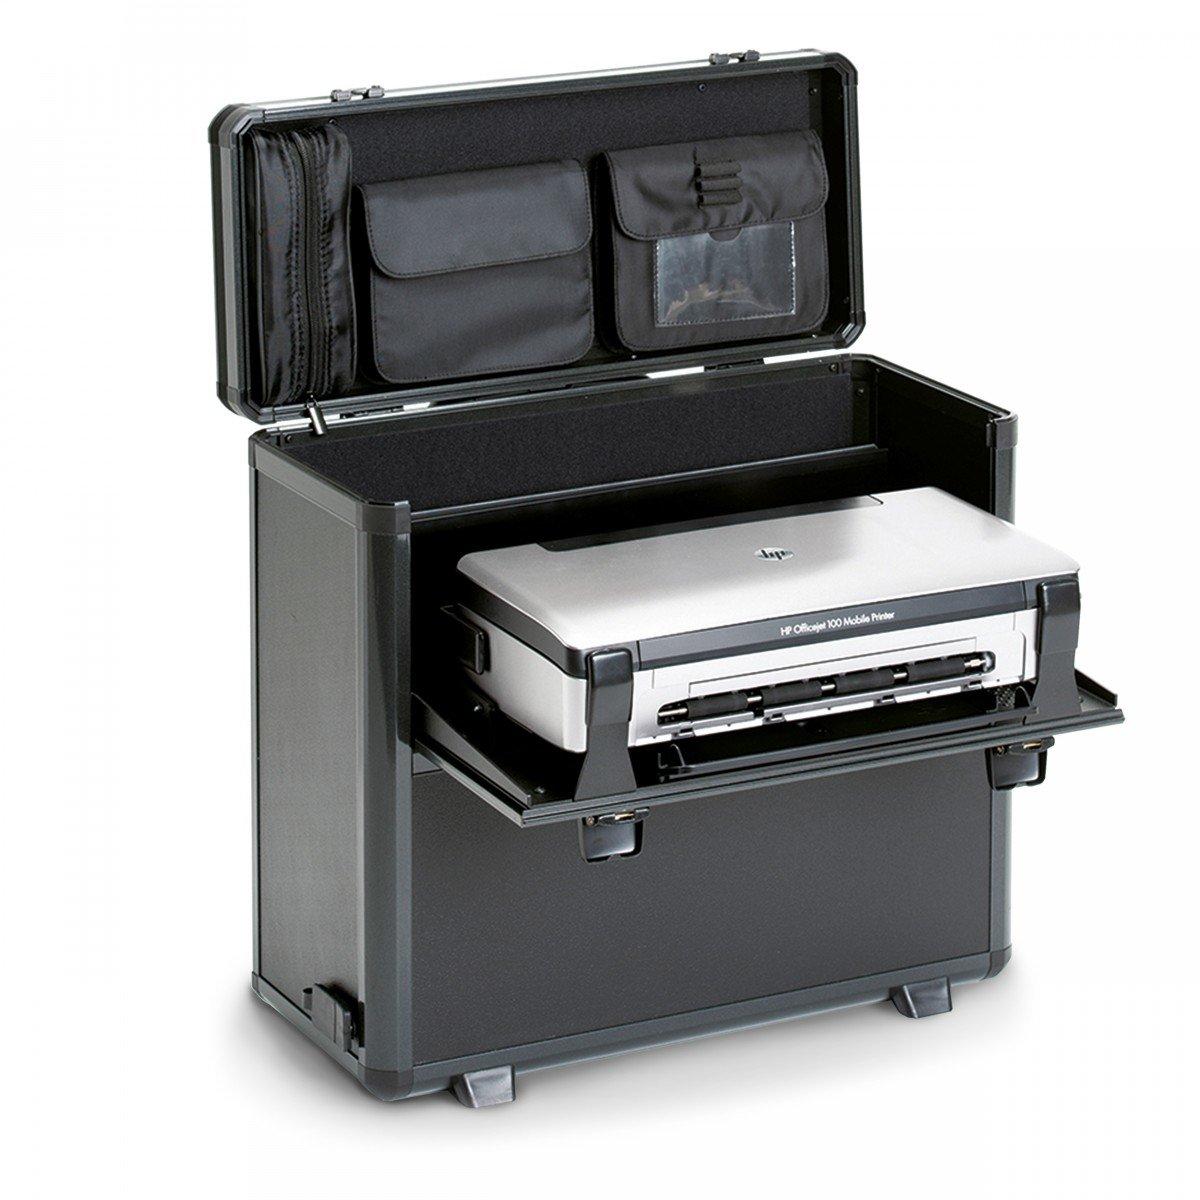 Dicota DataBox XL Trolley HP OJ 200 Impresora compacta ...